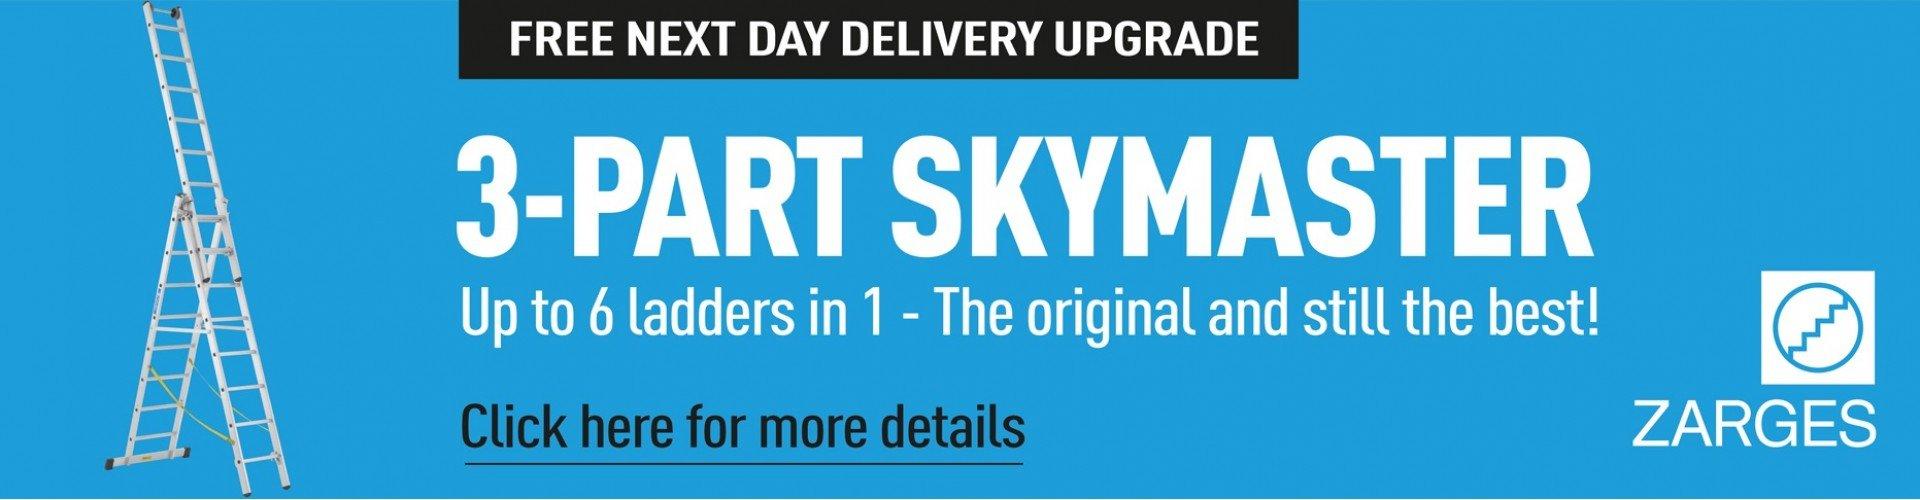 Skymaster Next Day